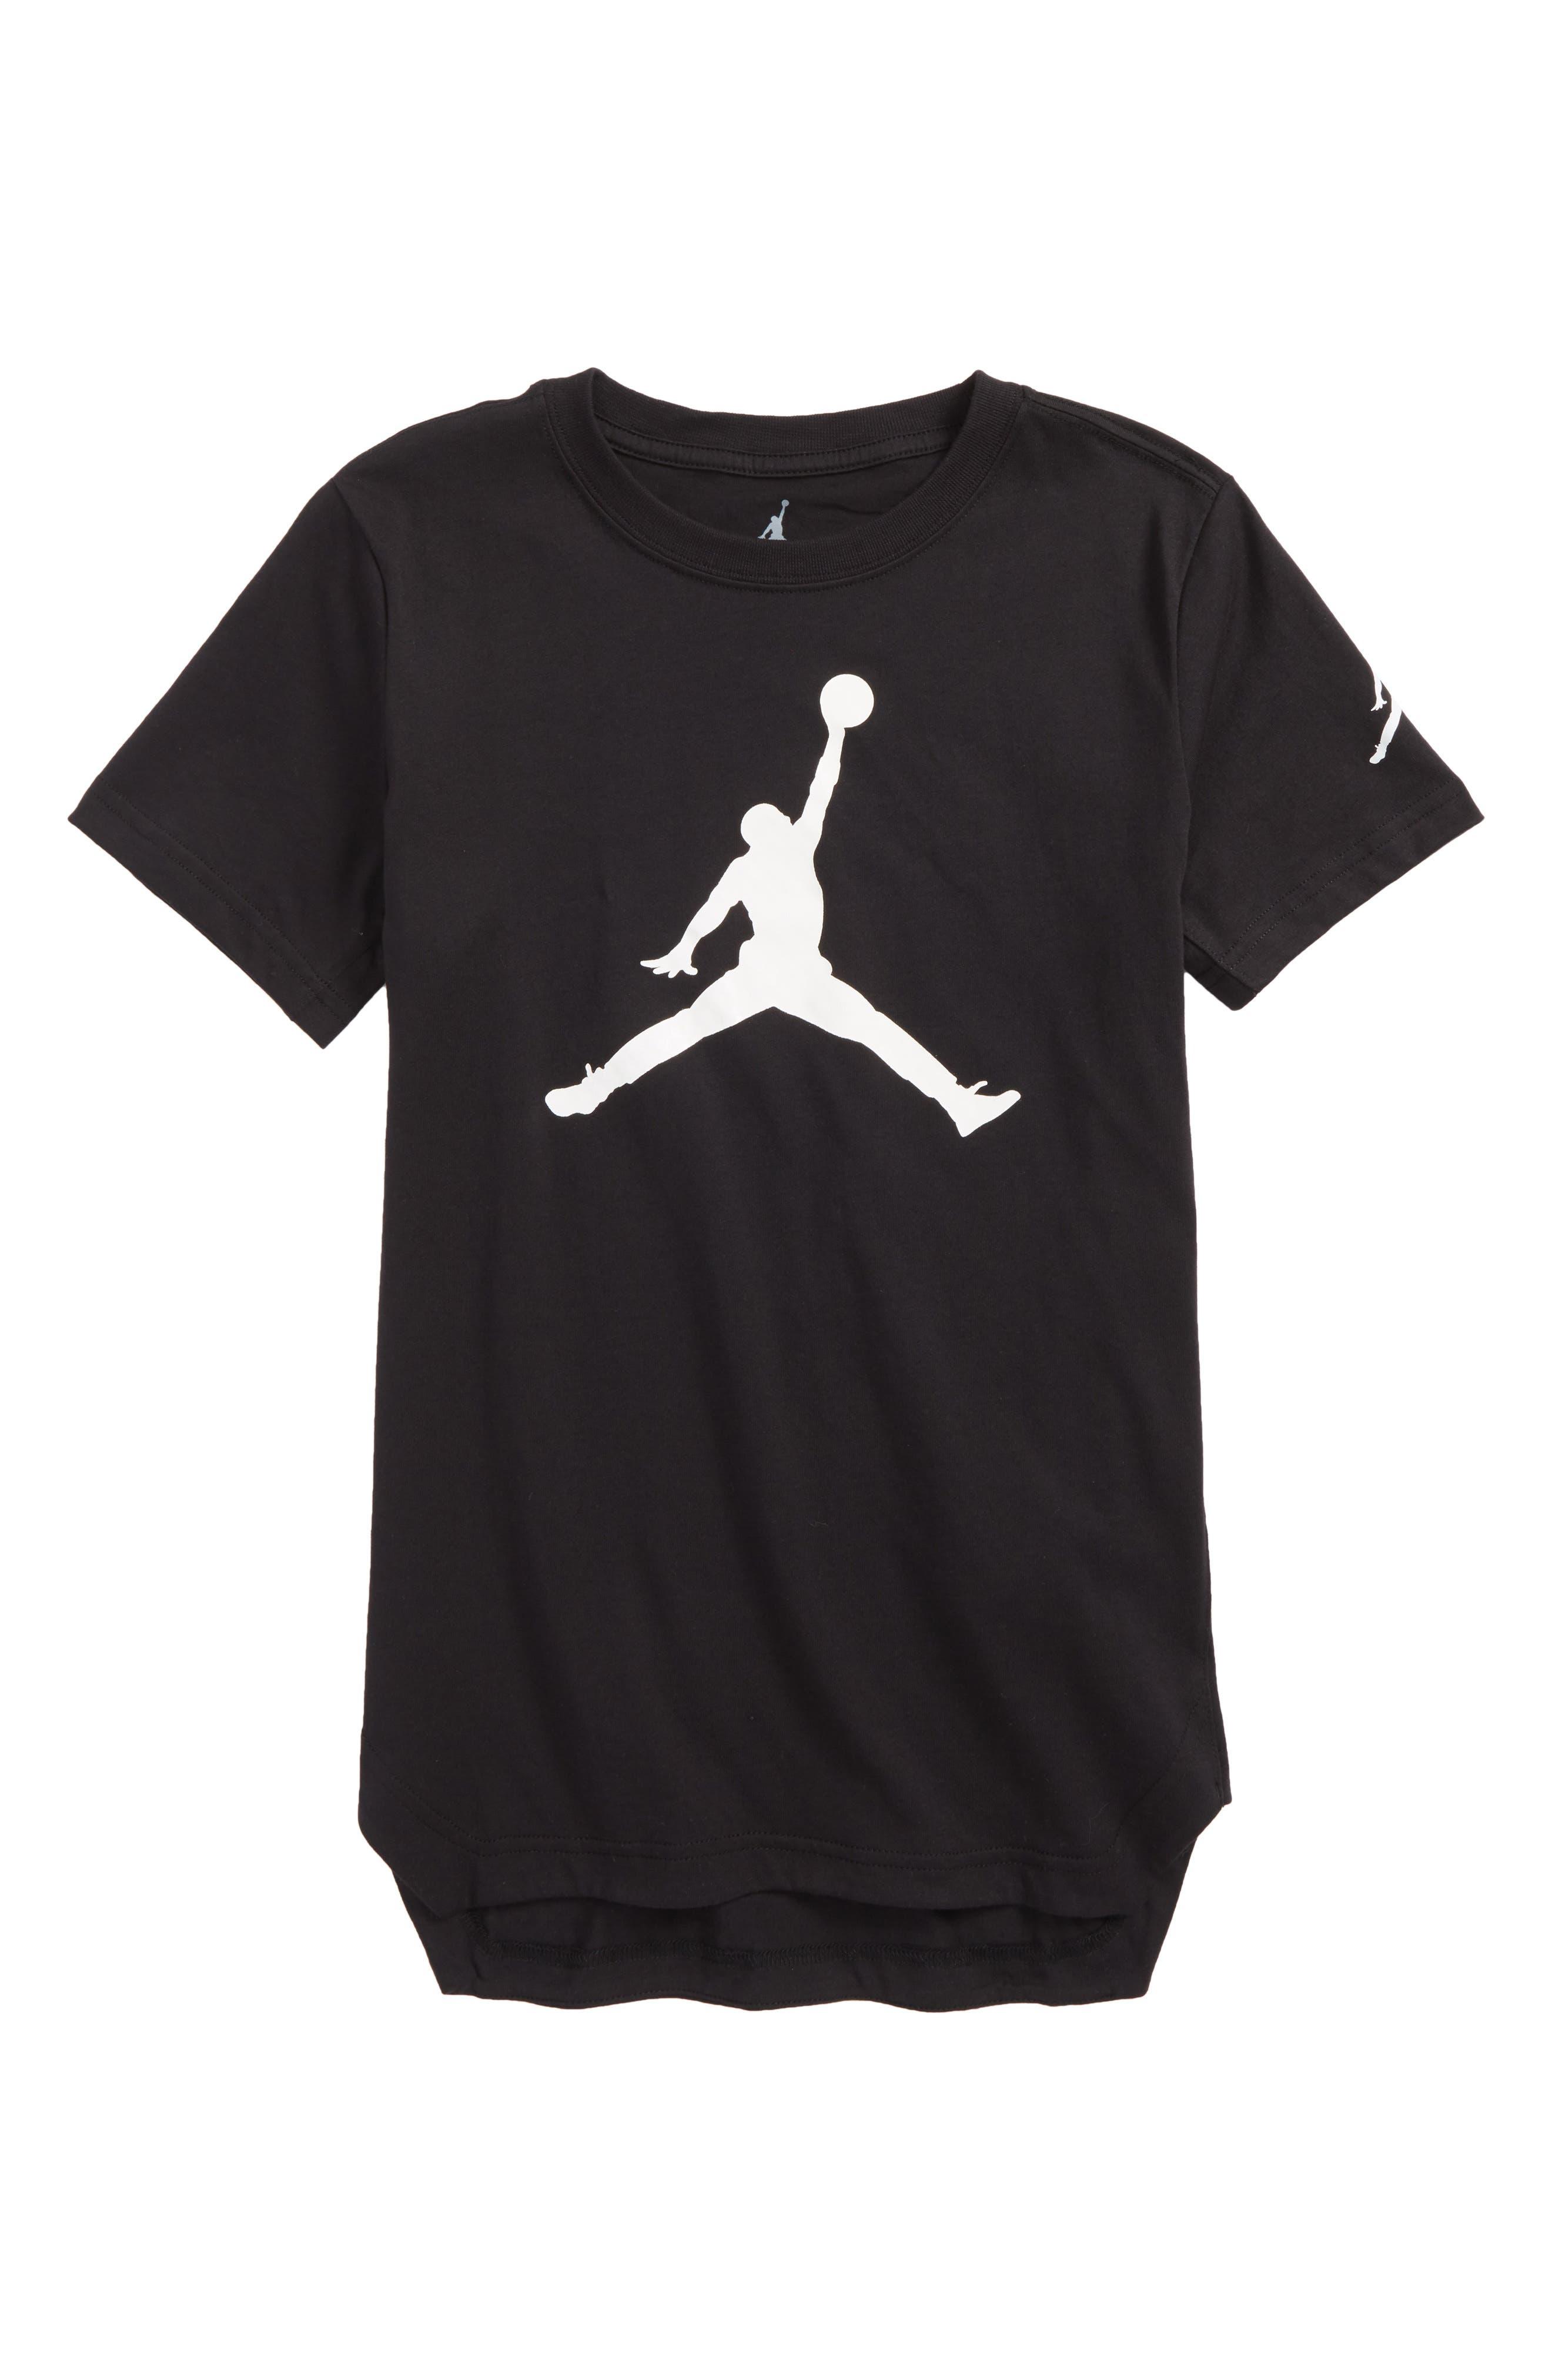 Jordan Jumpman Brand T-Shirt,                             Main thumbnail 1, color,                             Black